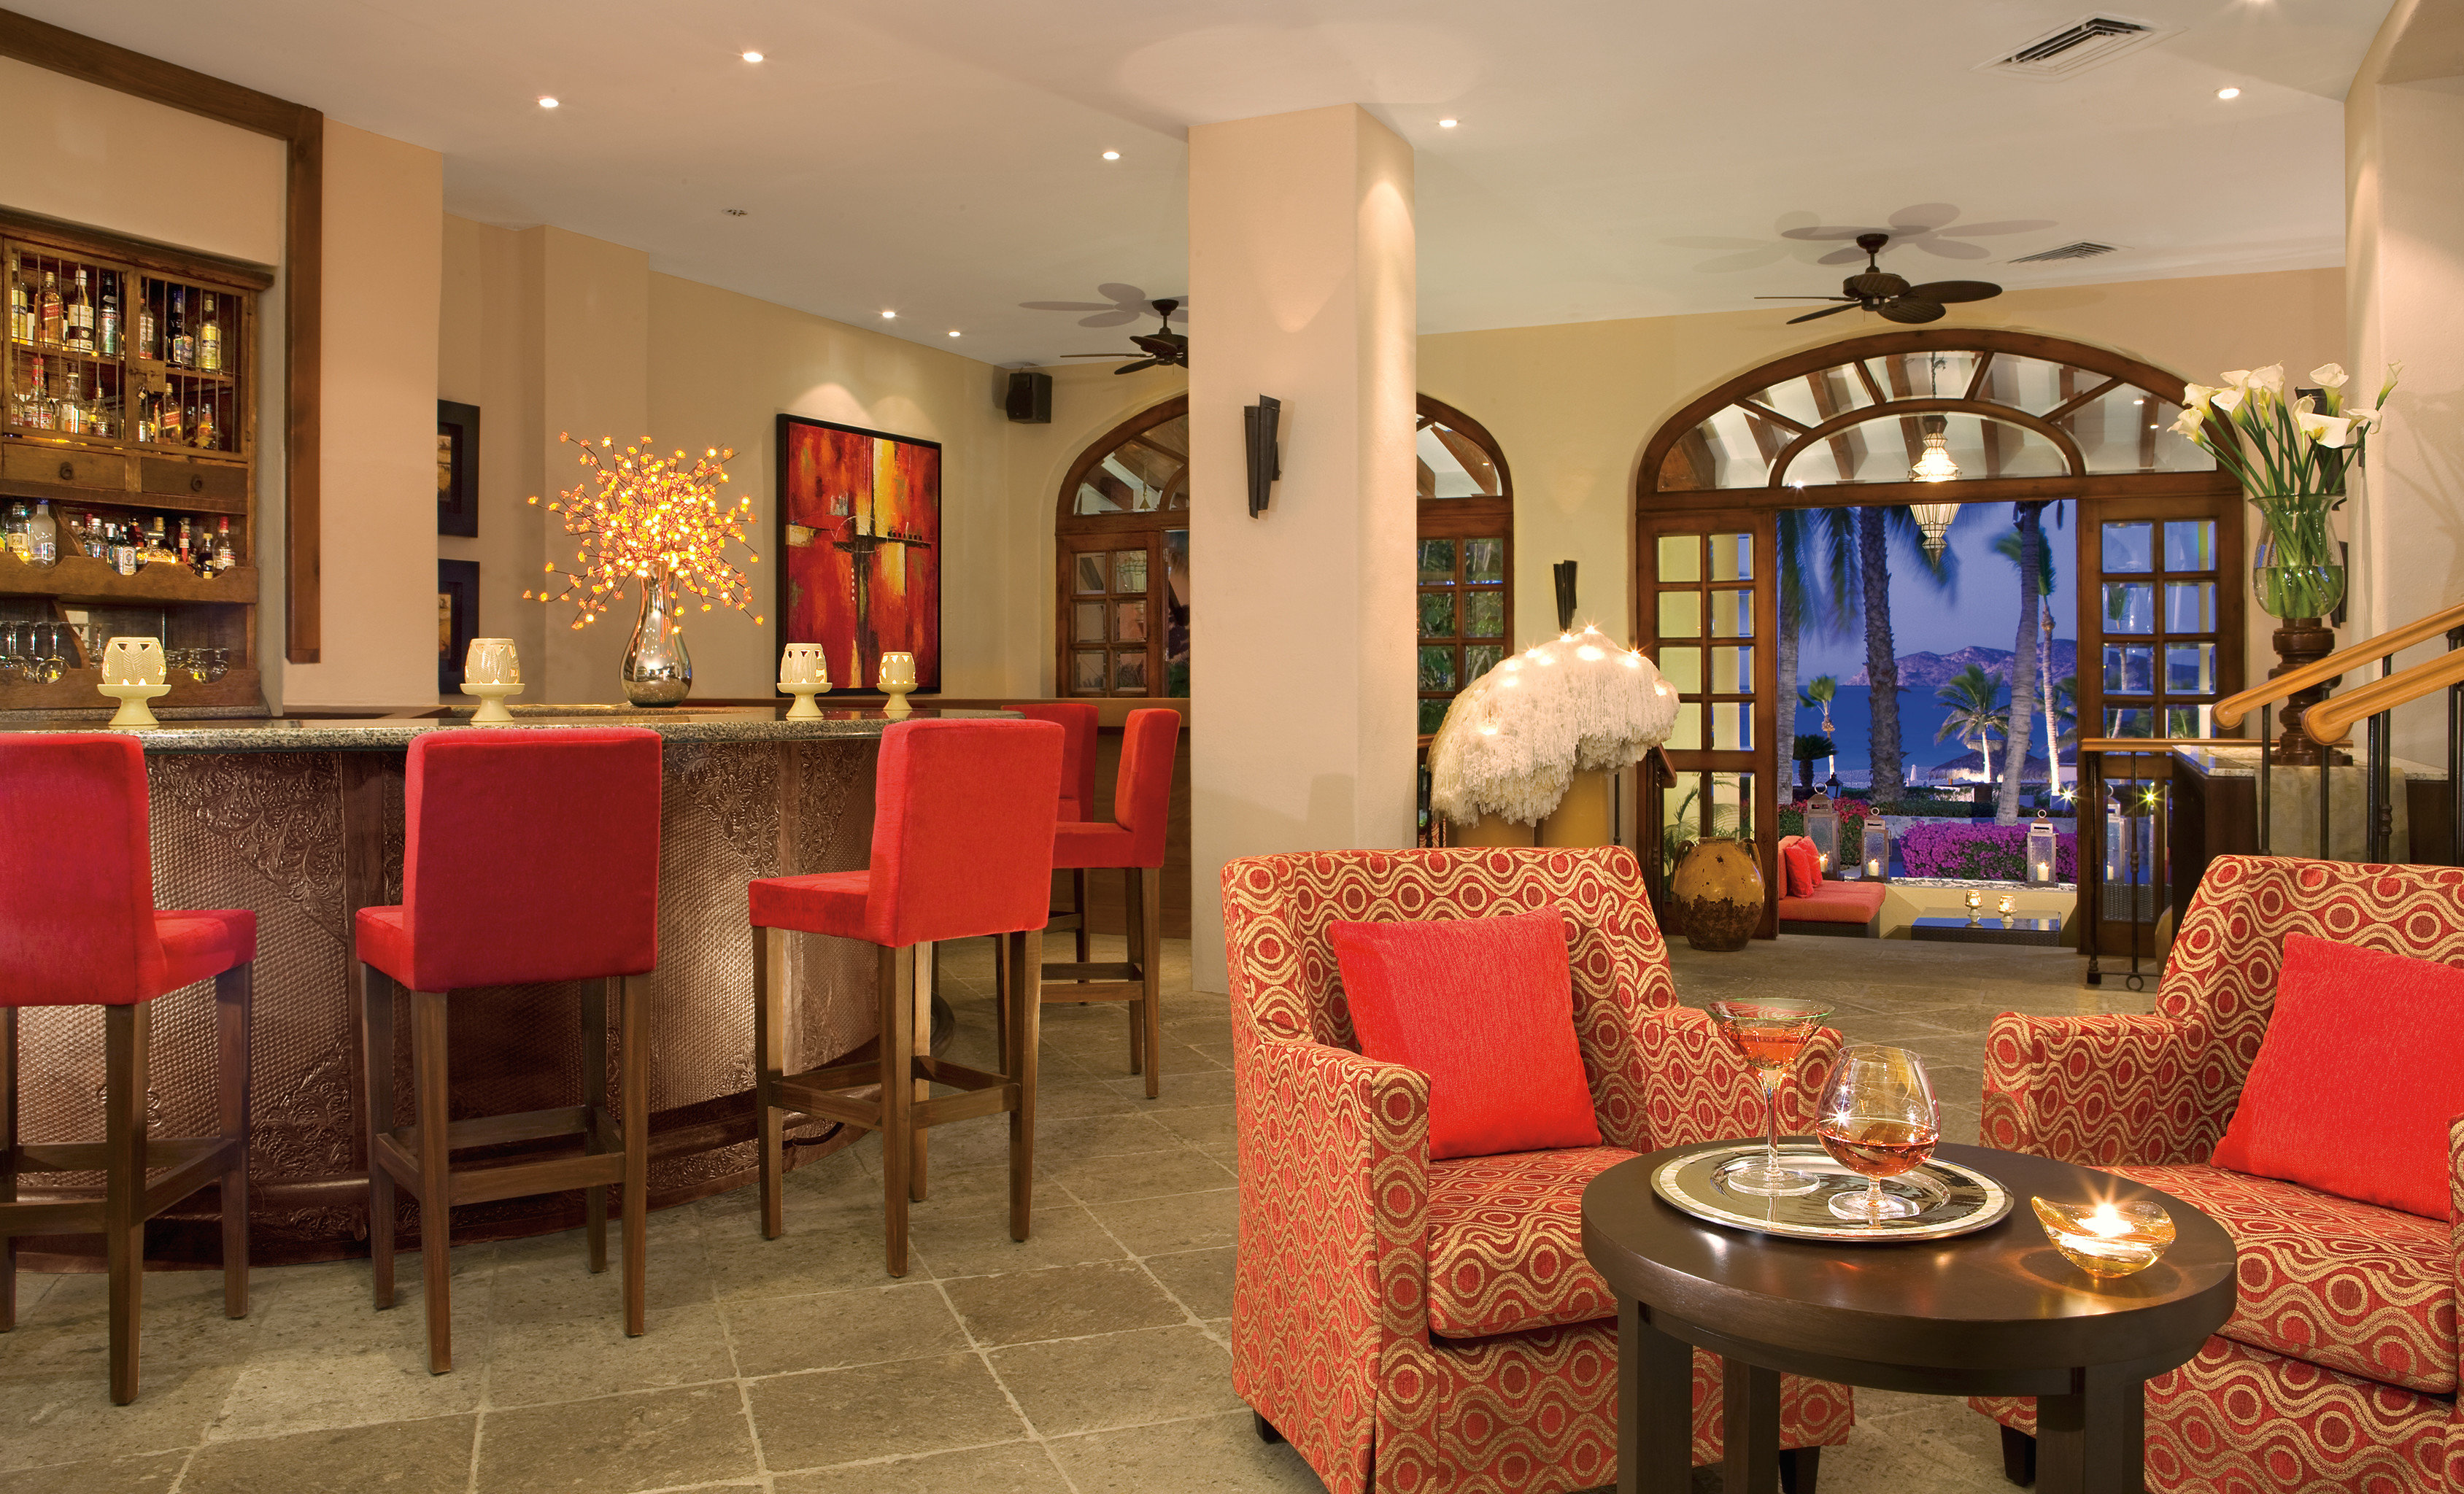 Bar Budget Dining Drink Eat Elegant Hotels Luxury Modern red chair property Lobby restaurant living room